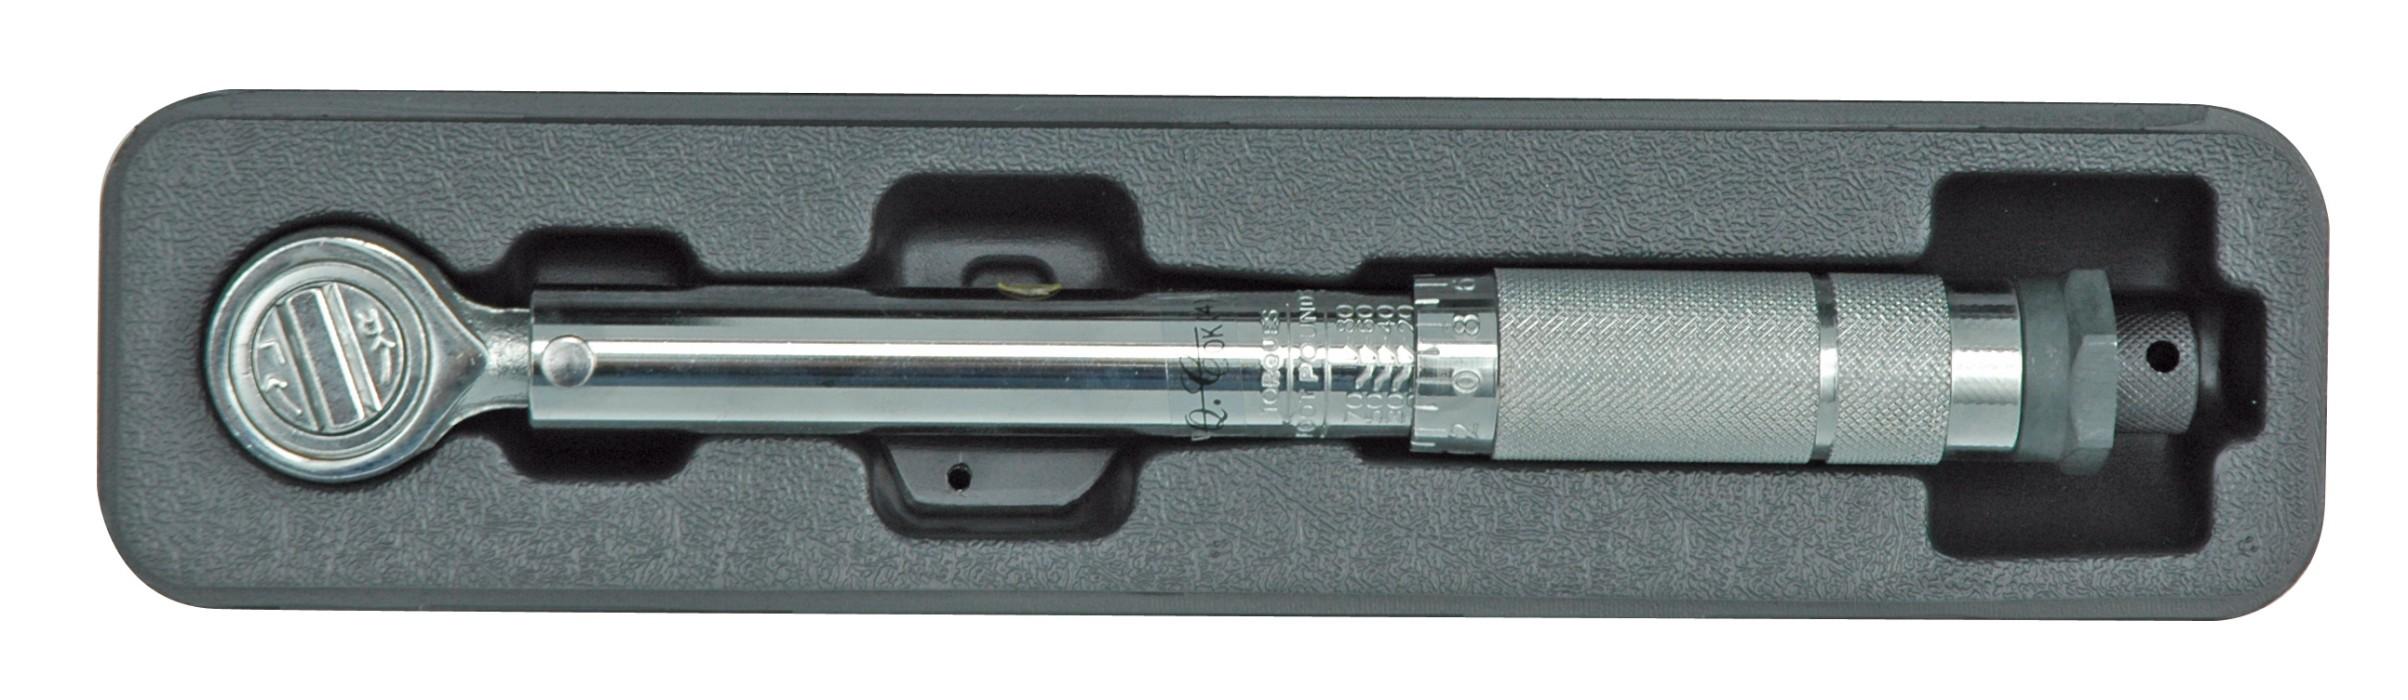 "Klíč momentový 3/8"" 270 mm 13,6-108Nm"